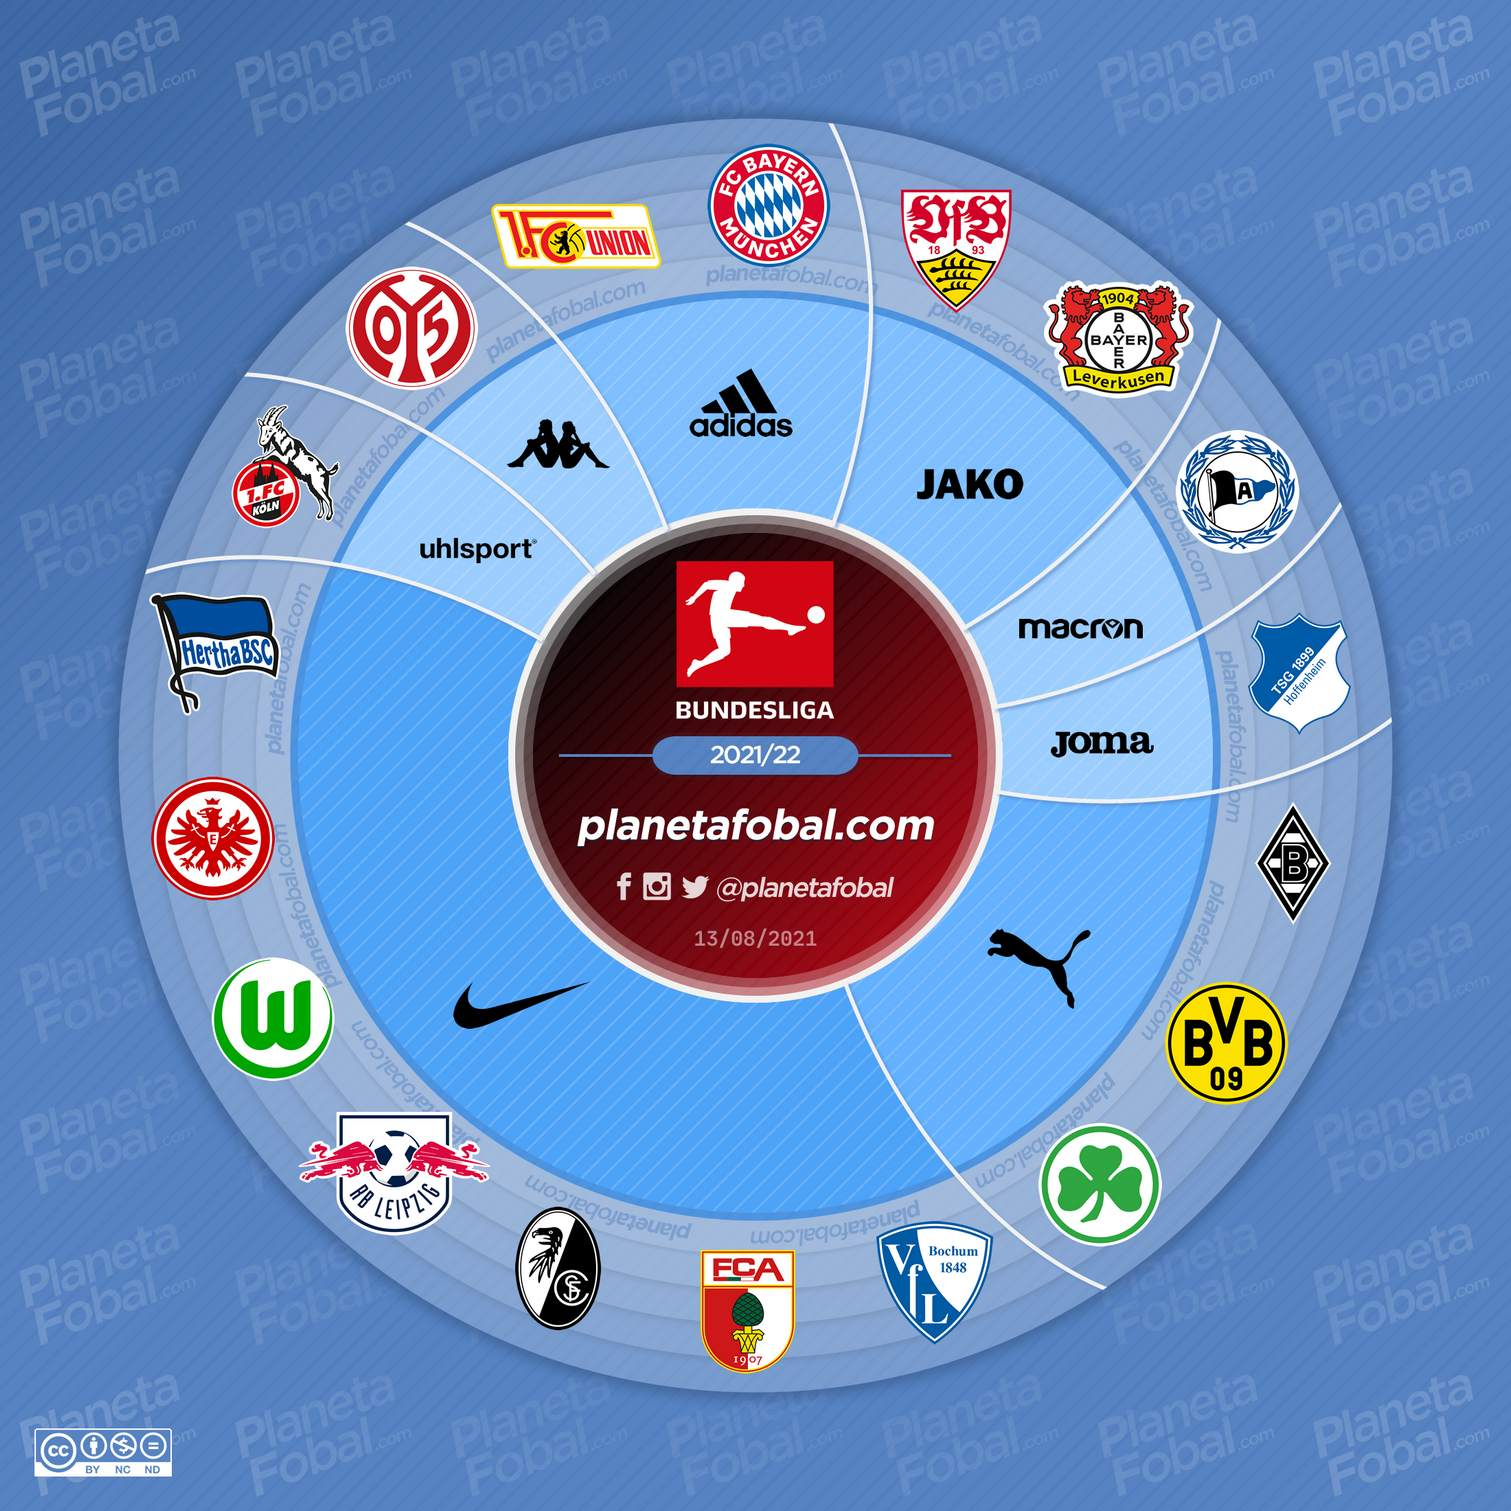 Marcas deportivas de la Bundesliga 2021/2022